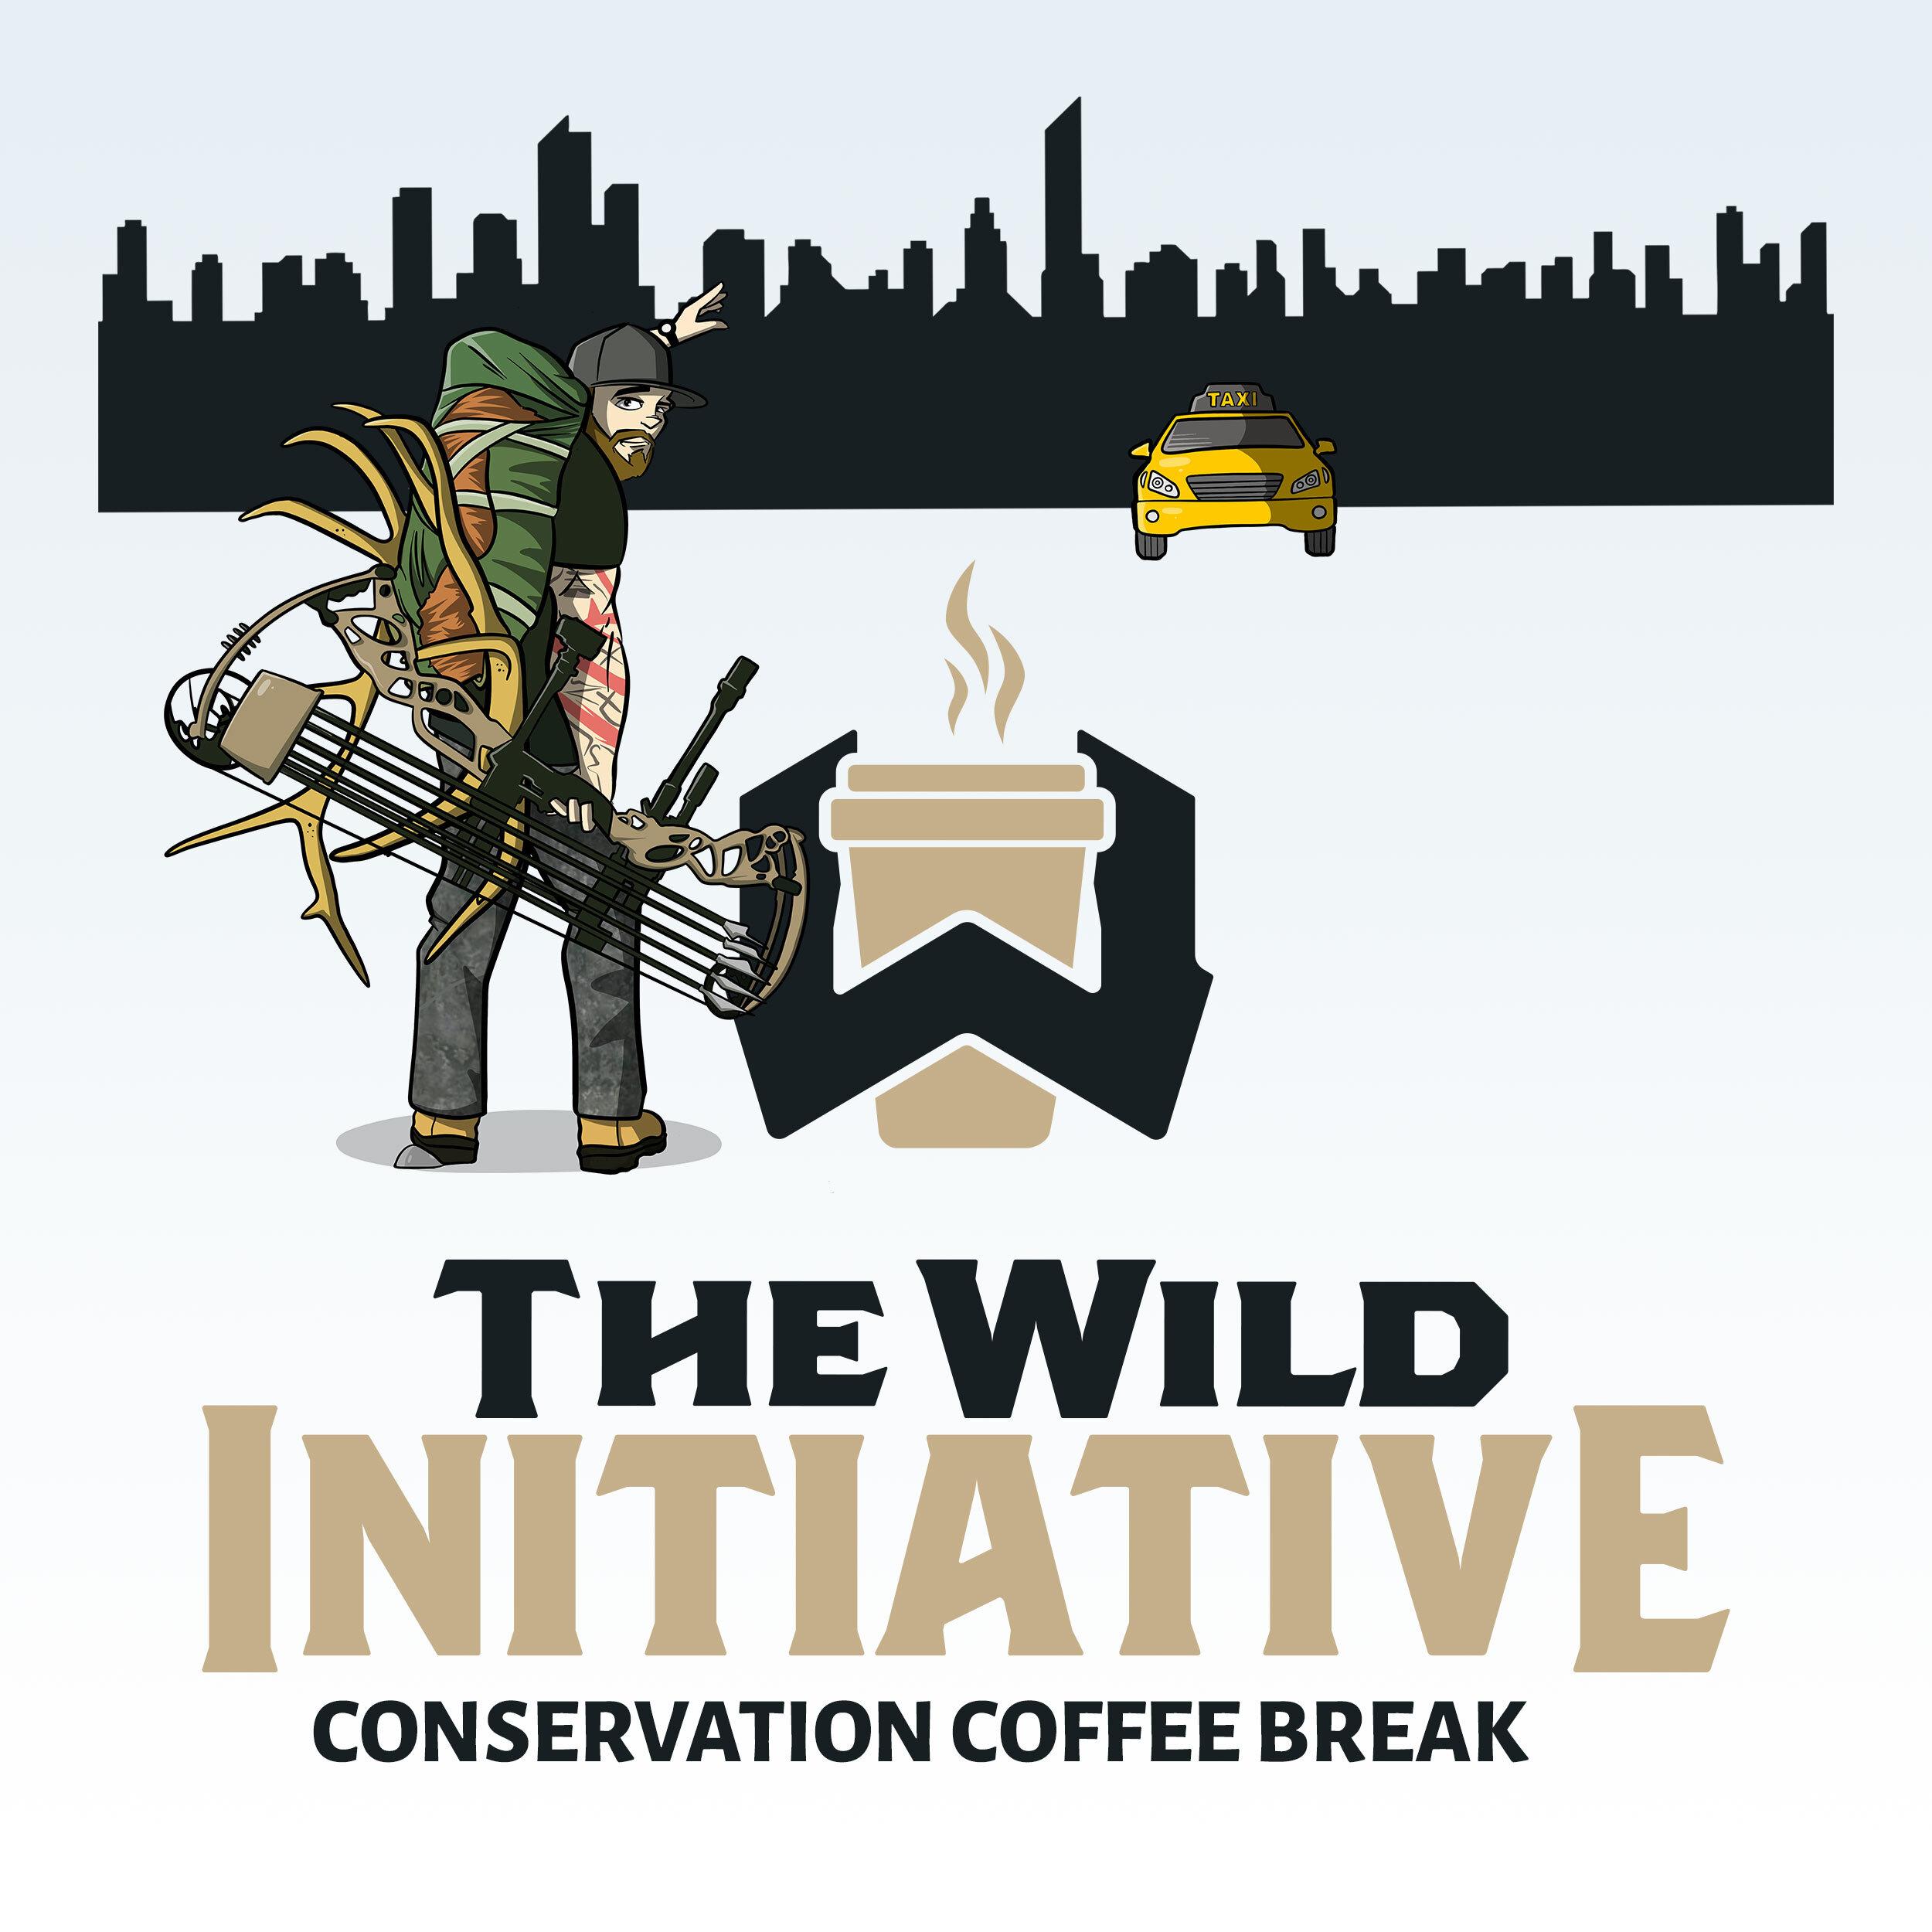 The Wild Initiative Conservation Coffee Break